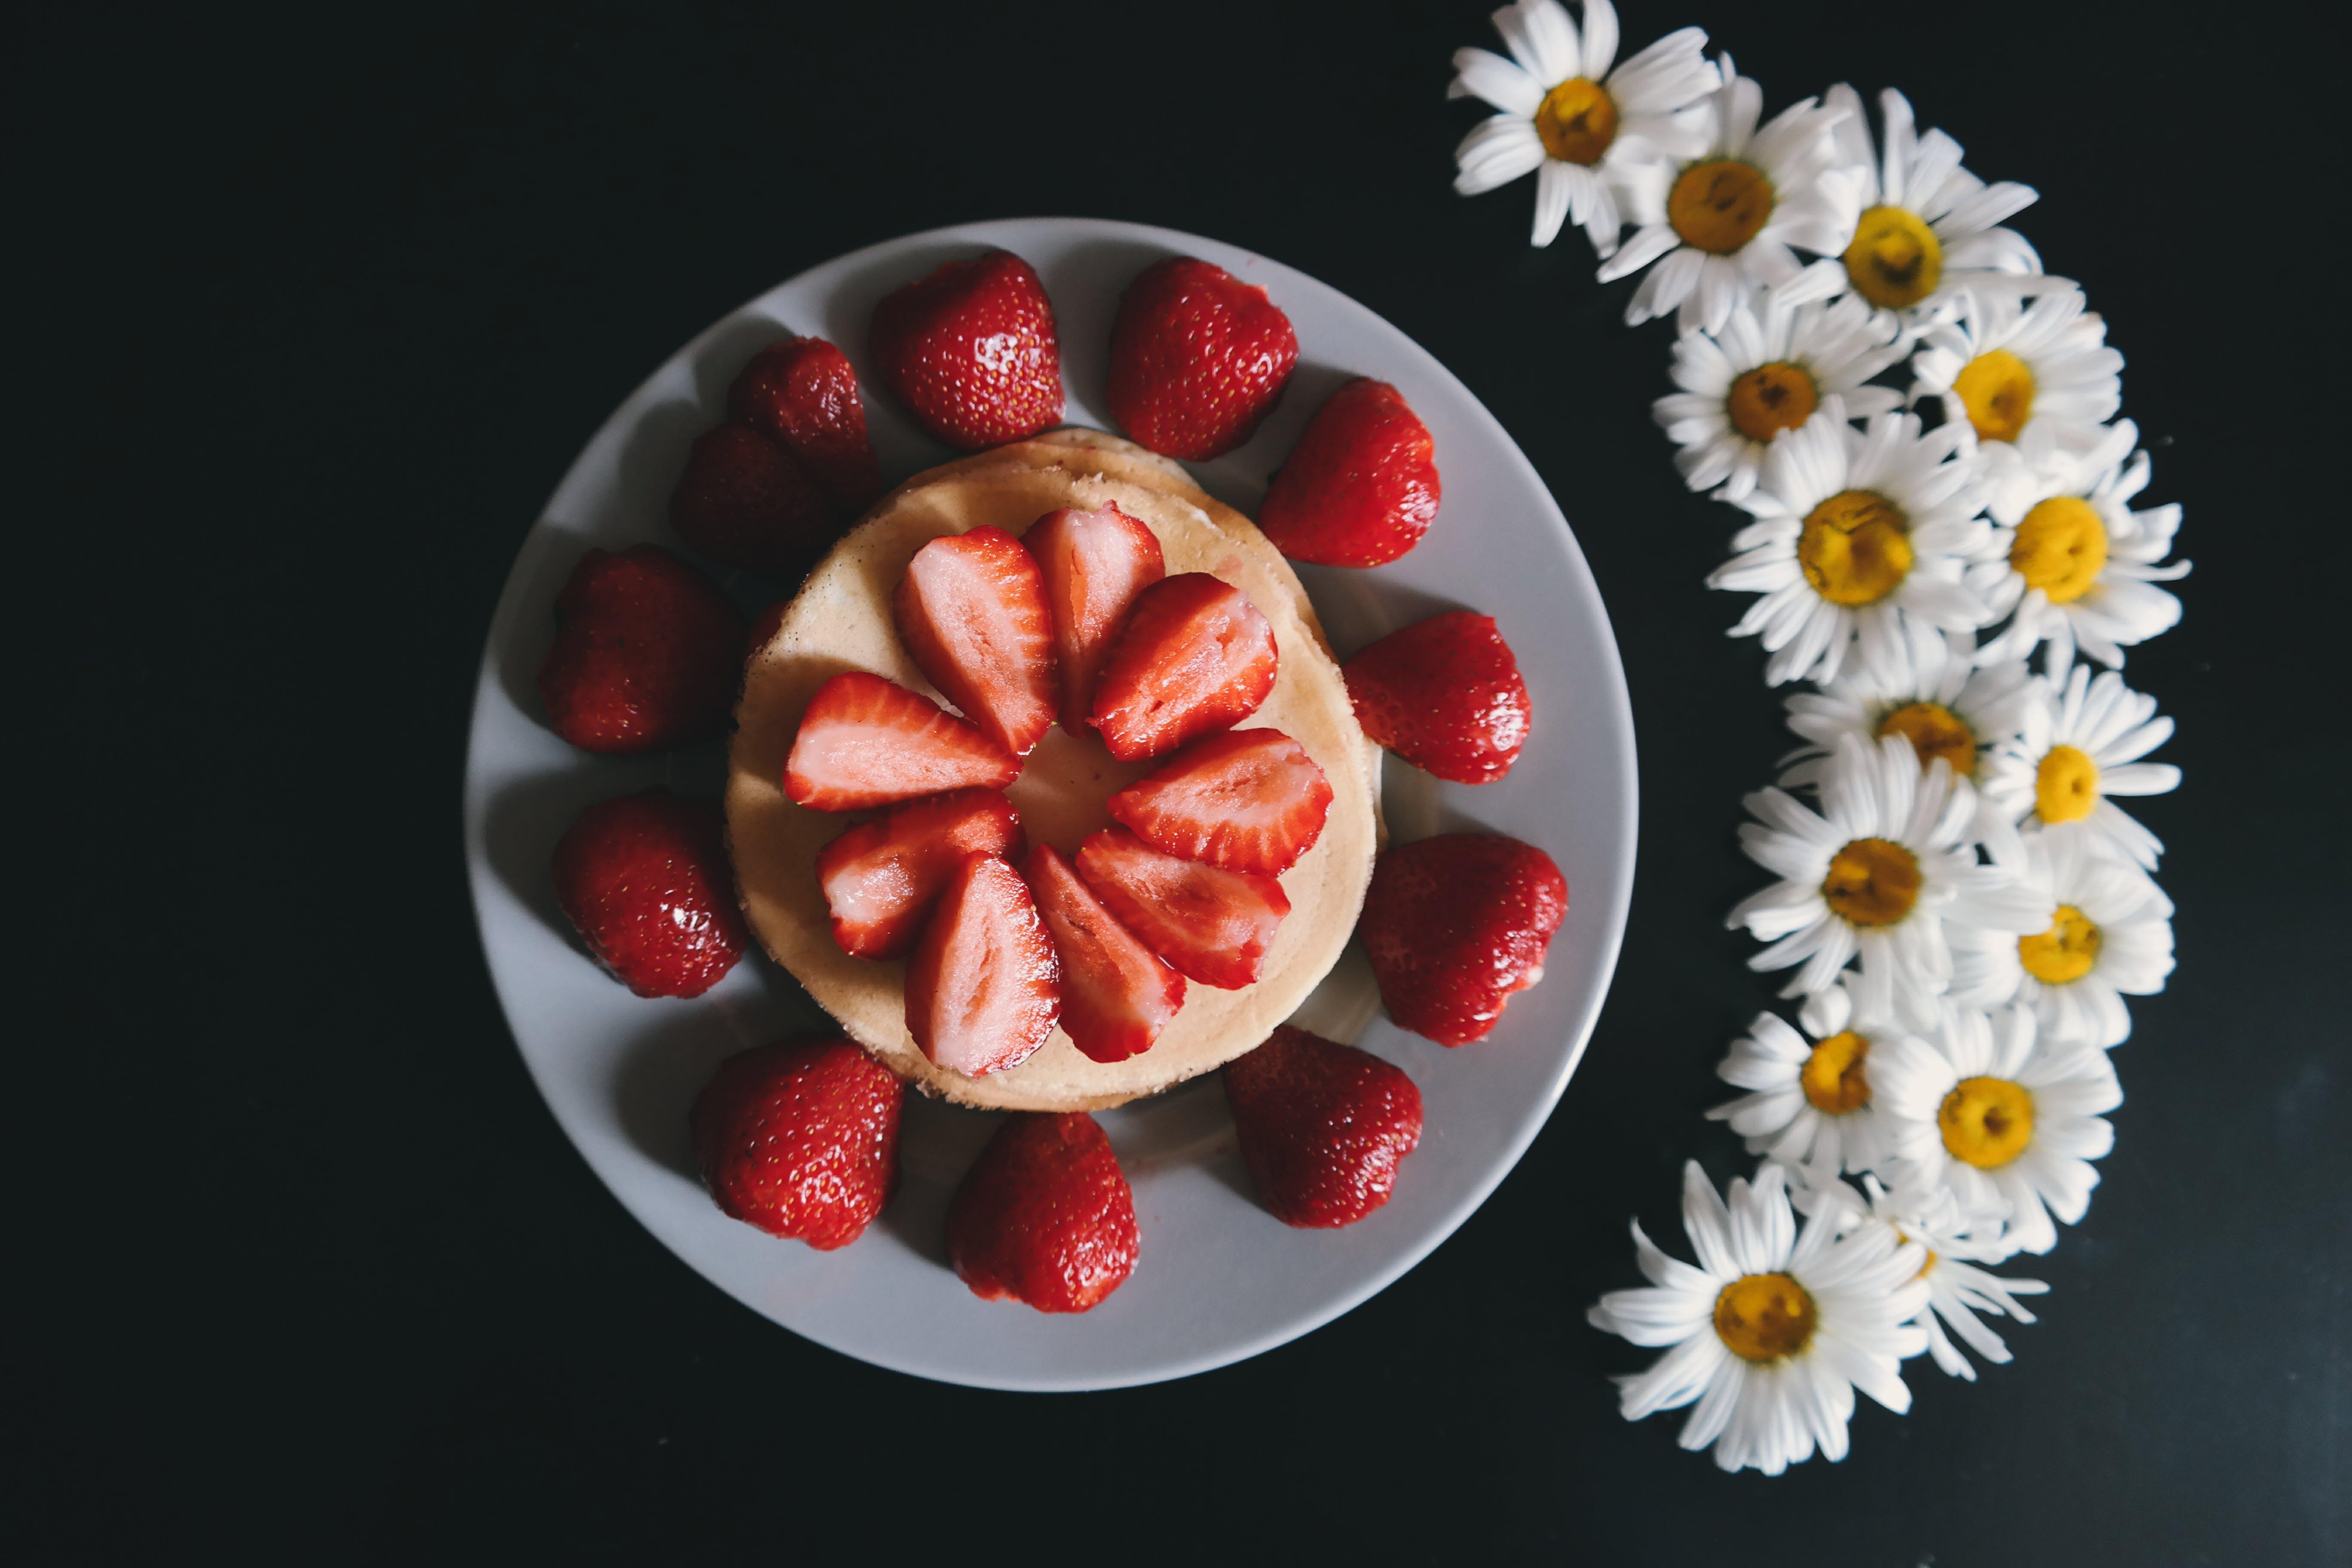 Kostenloses Stock Foto zu beeren, blumen, draufsicht, erdbeeren